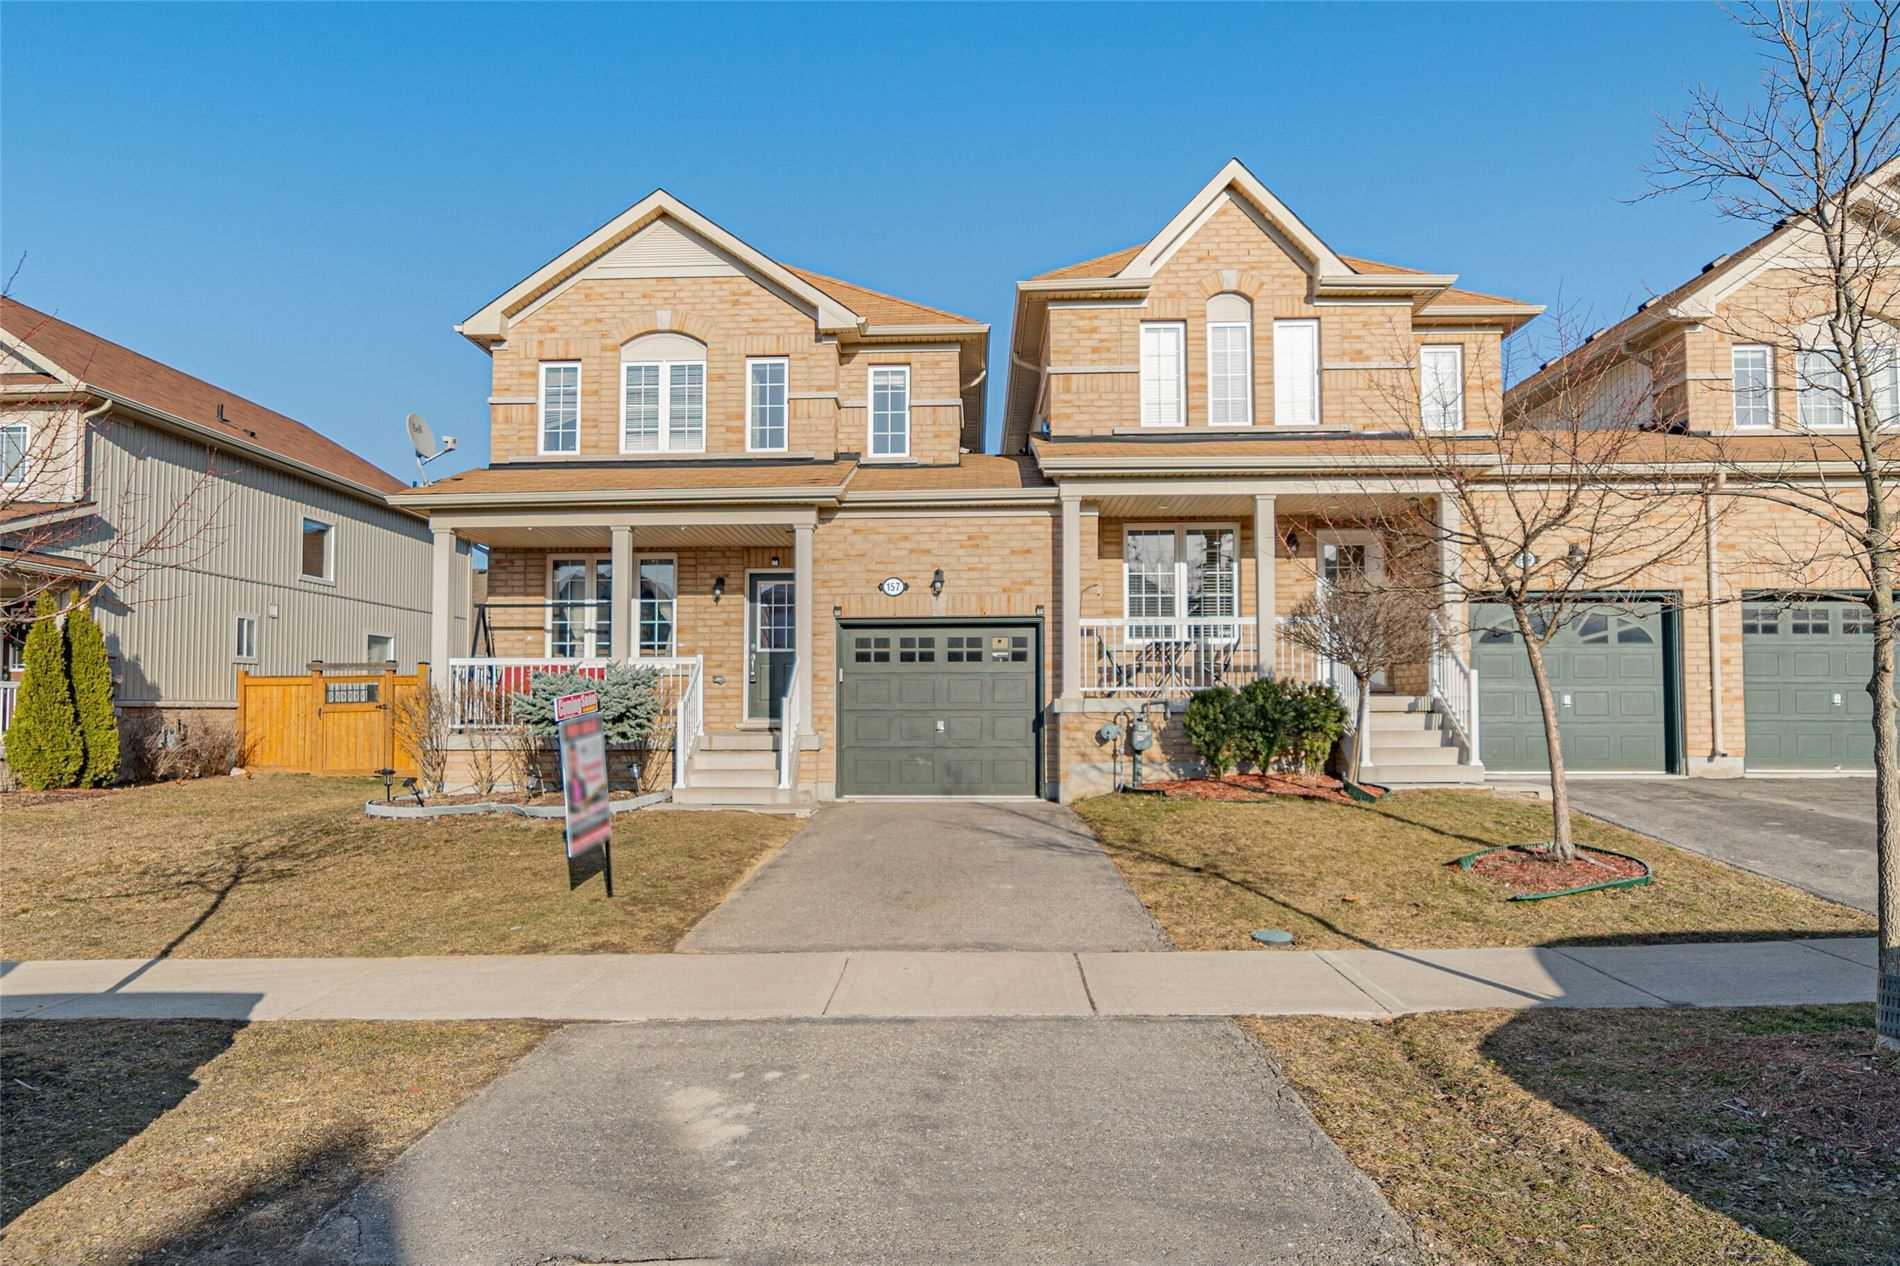 157 Thomas Ave, Brantford, Ontario N3S 0C8, 3 Bedrooms Bedrooms, ,3 BathroomsBathrooms,Att/row/twnhouse,For Sale,Thomas,X5160617